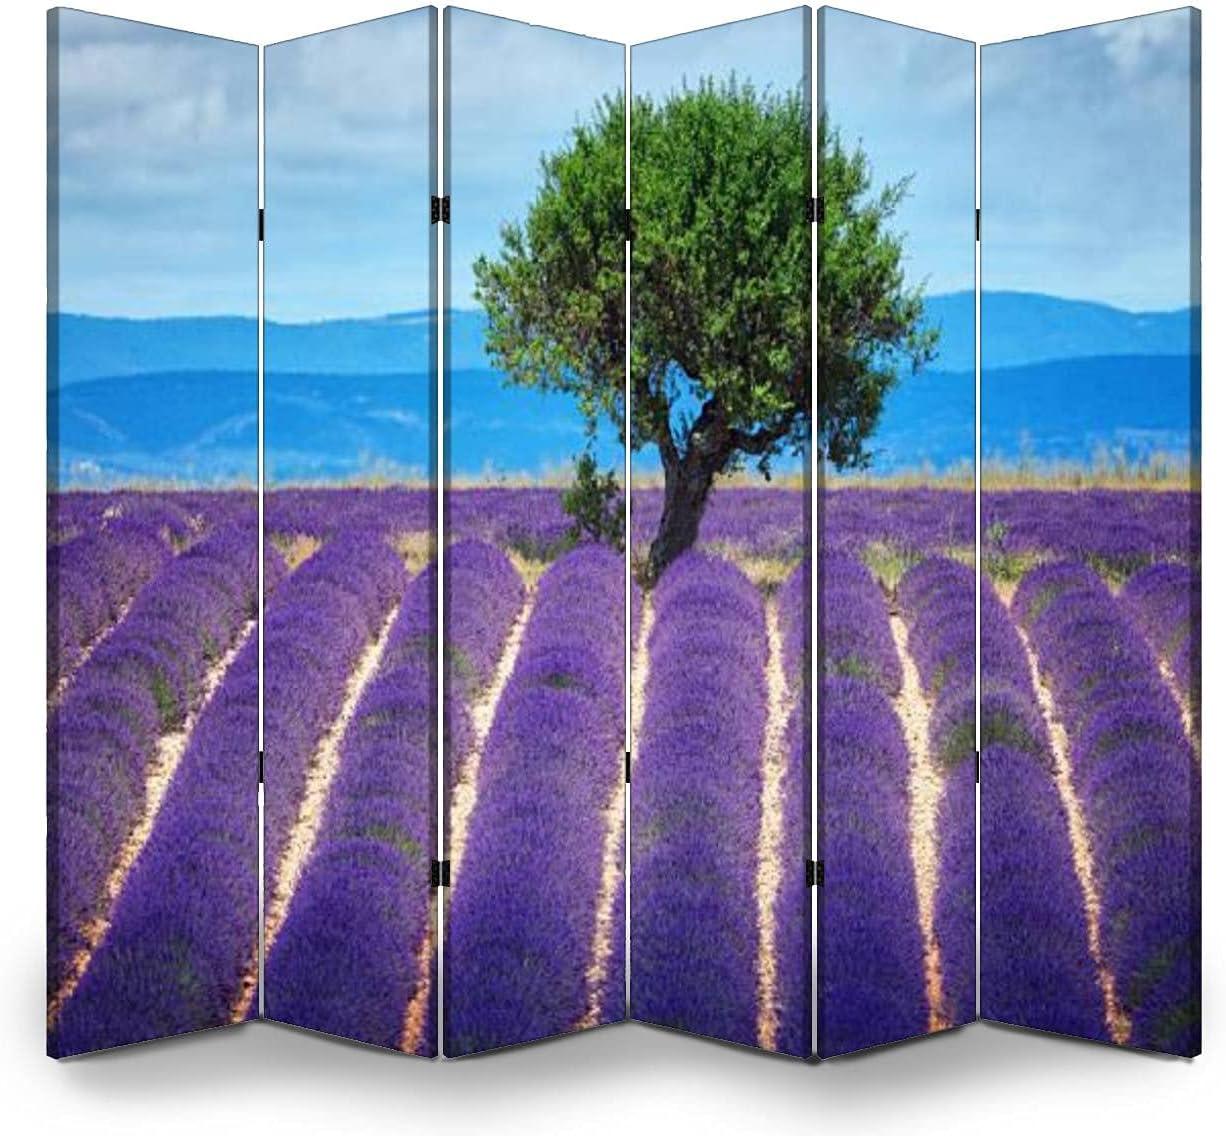 Max 62% OFF Dola-Dola 6 Panel Screen Room in Fields Award Divider Provenc Lavender